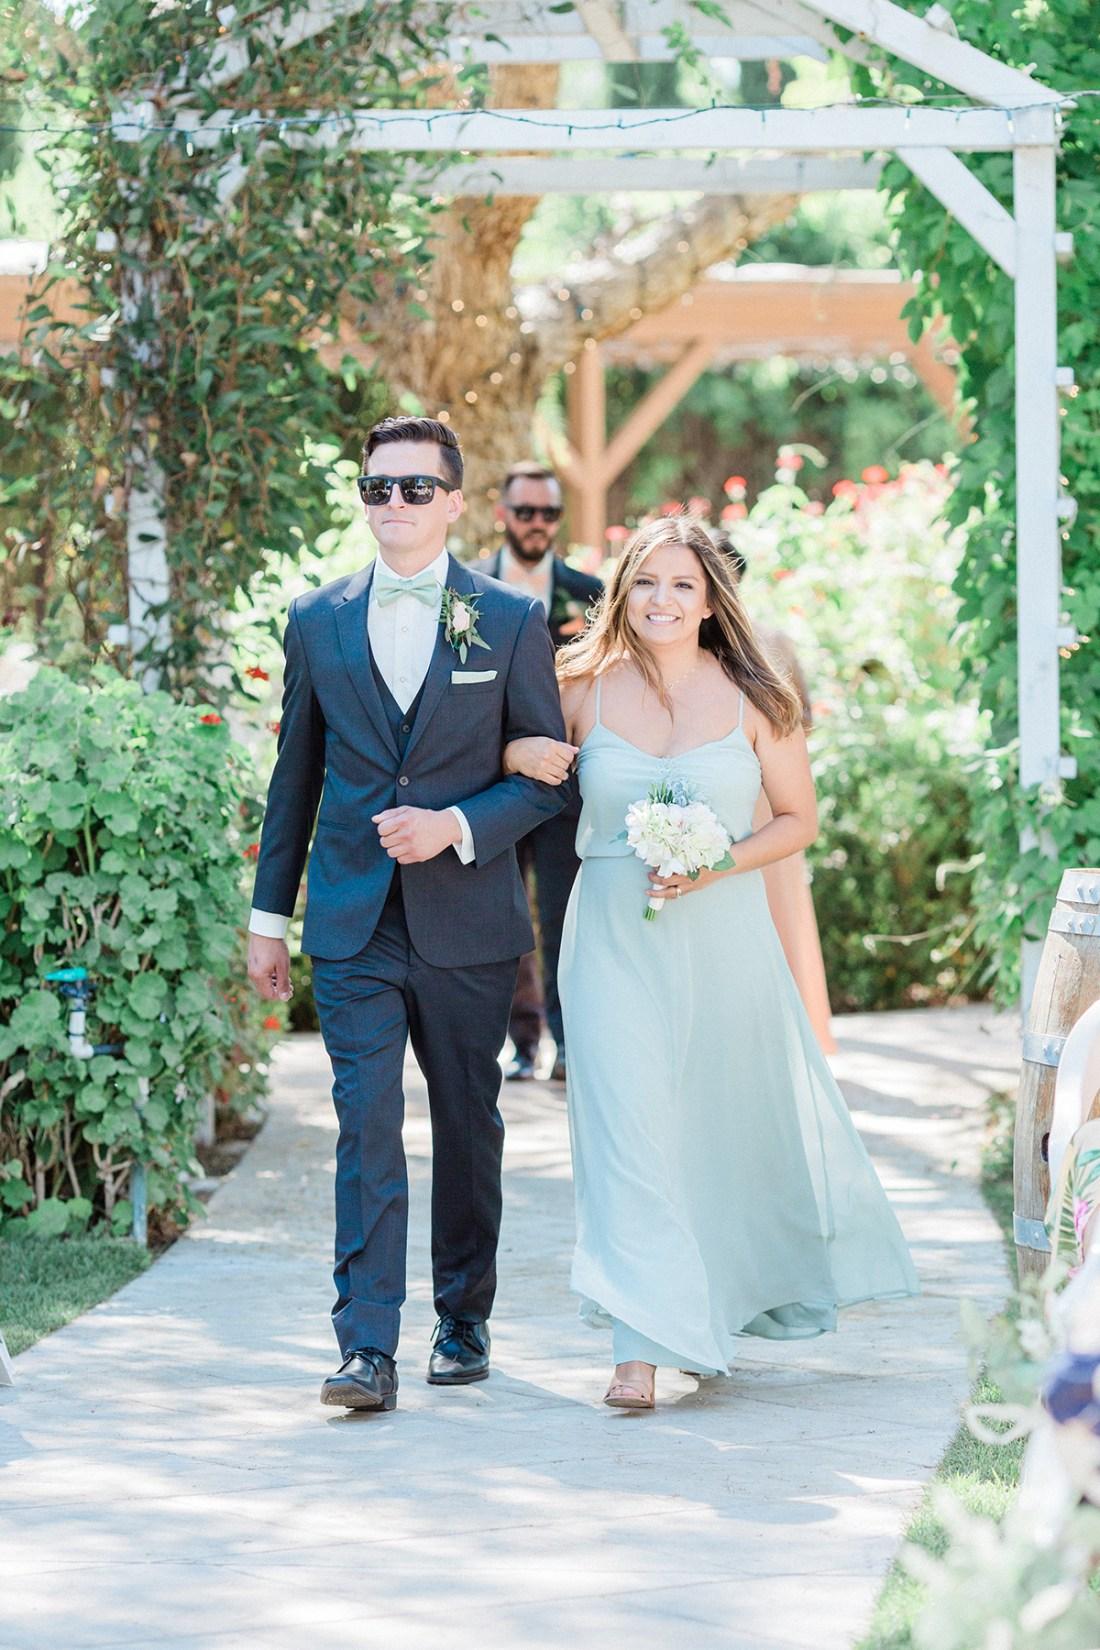 Amanda & Steve's Wedding- Bridal Party   A Good Hue